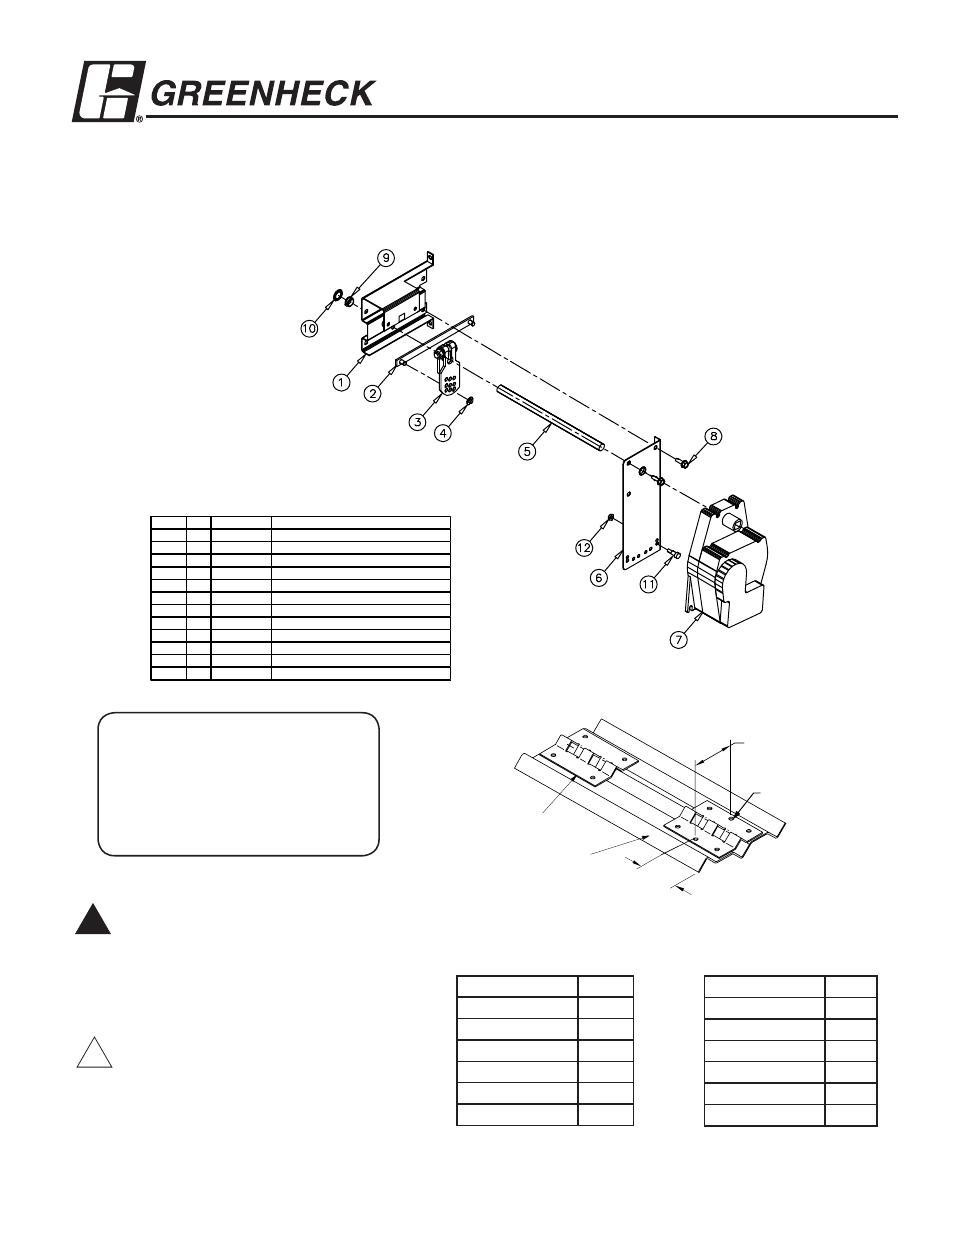 Honeywell Ml4302f1008 Actuator Wiring Diagram Trusted. Greenheck Ml4xxx Ml8xxx Series 459011 User Manual 2 Pages Honeywell Humidistat Wiring Diagrams Ml4302f1008 Actuator Diagram. Wiring. Honeywell Ms7520 Actuator Wiring Diagram At Scoala.co